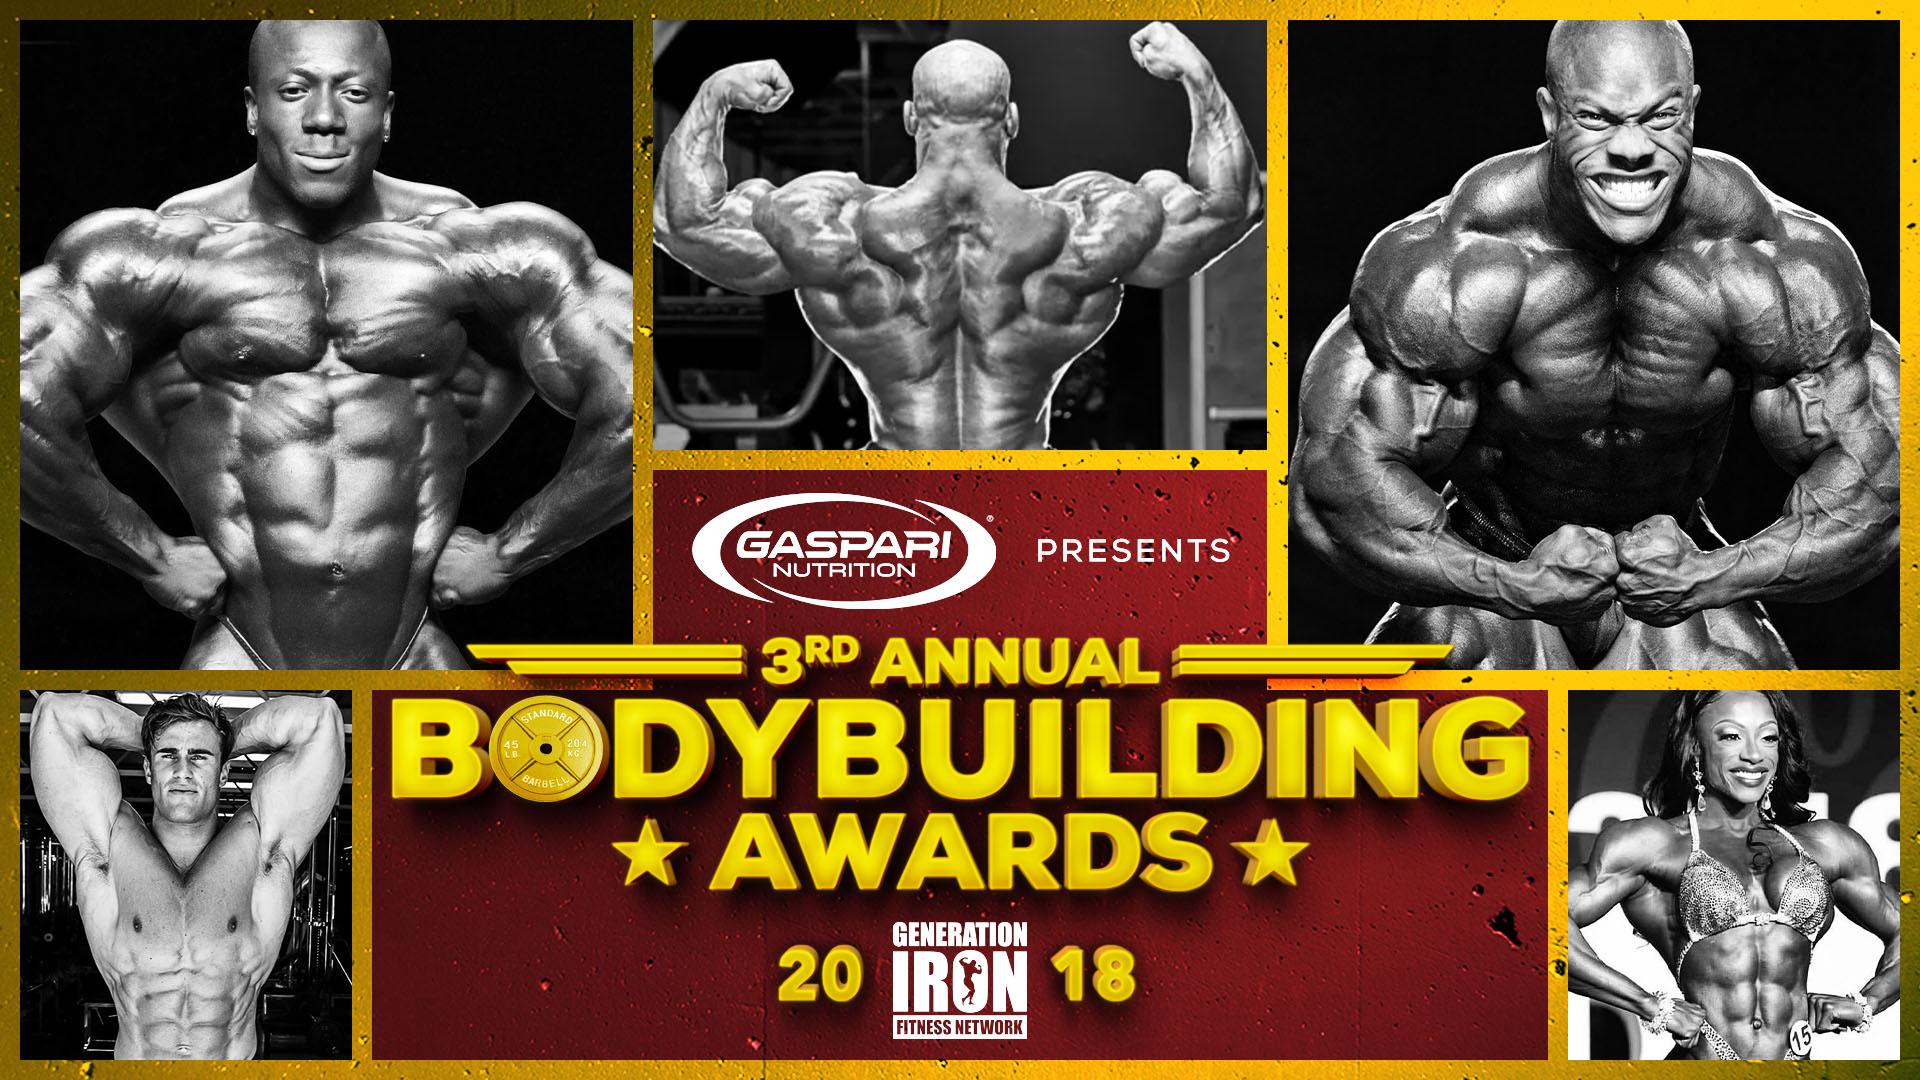 Bodybuilding Awards 2018